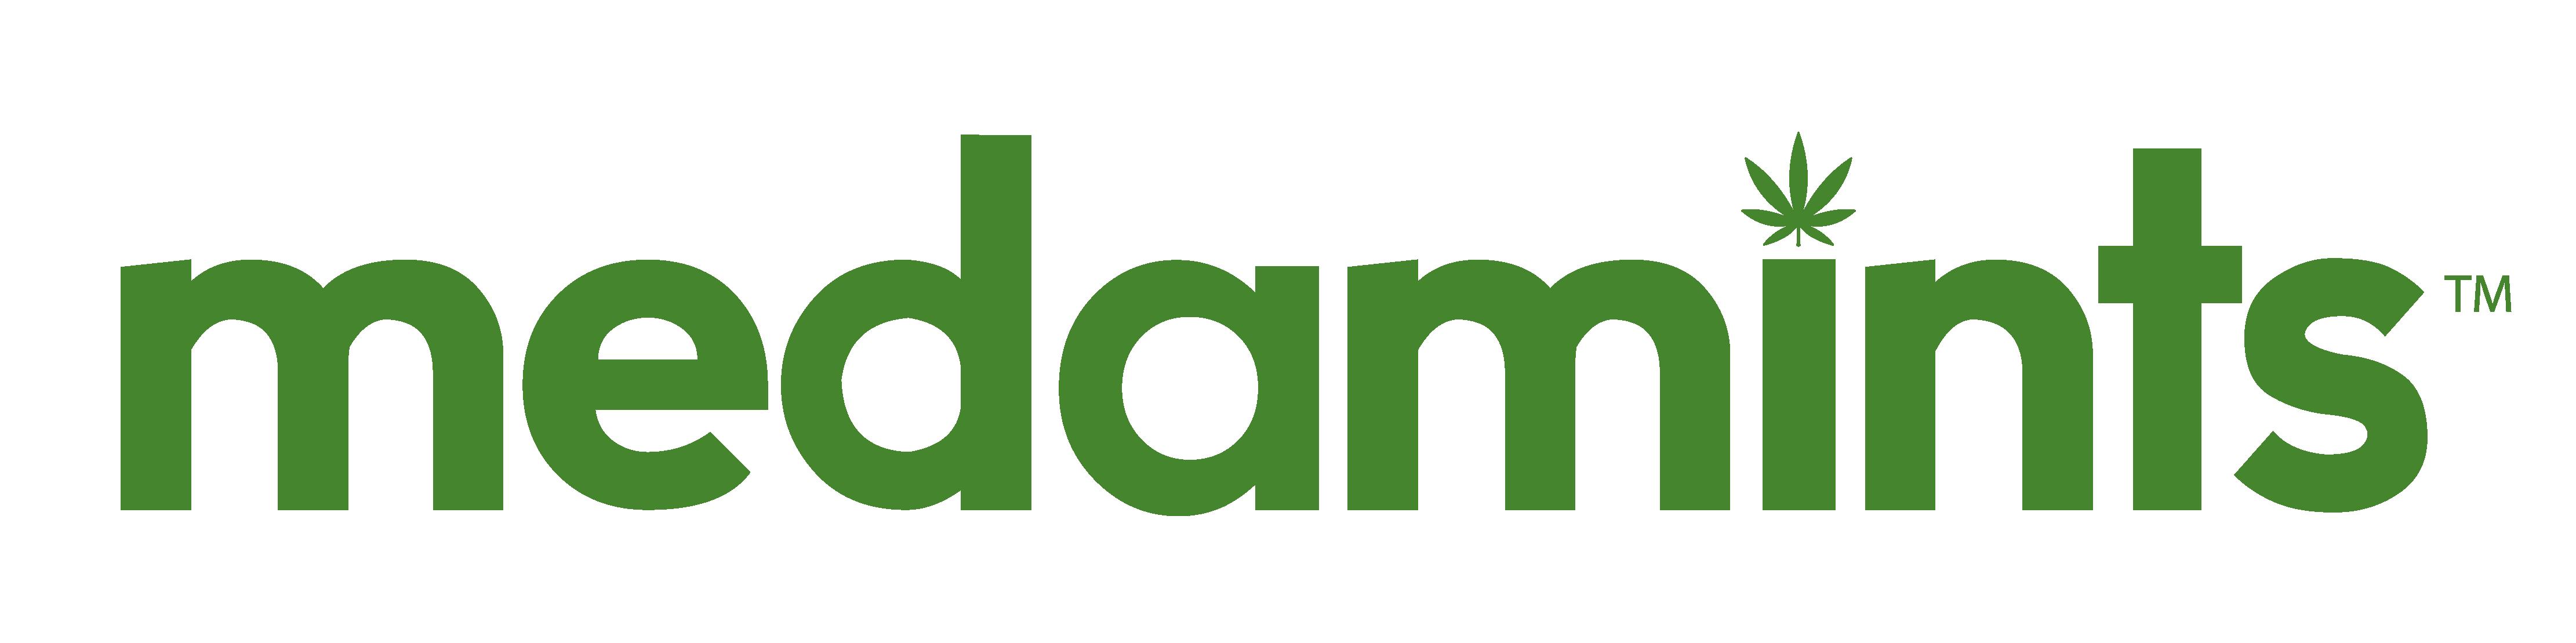 2017-medamints-logo-green-01